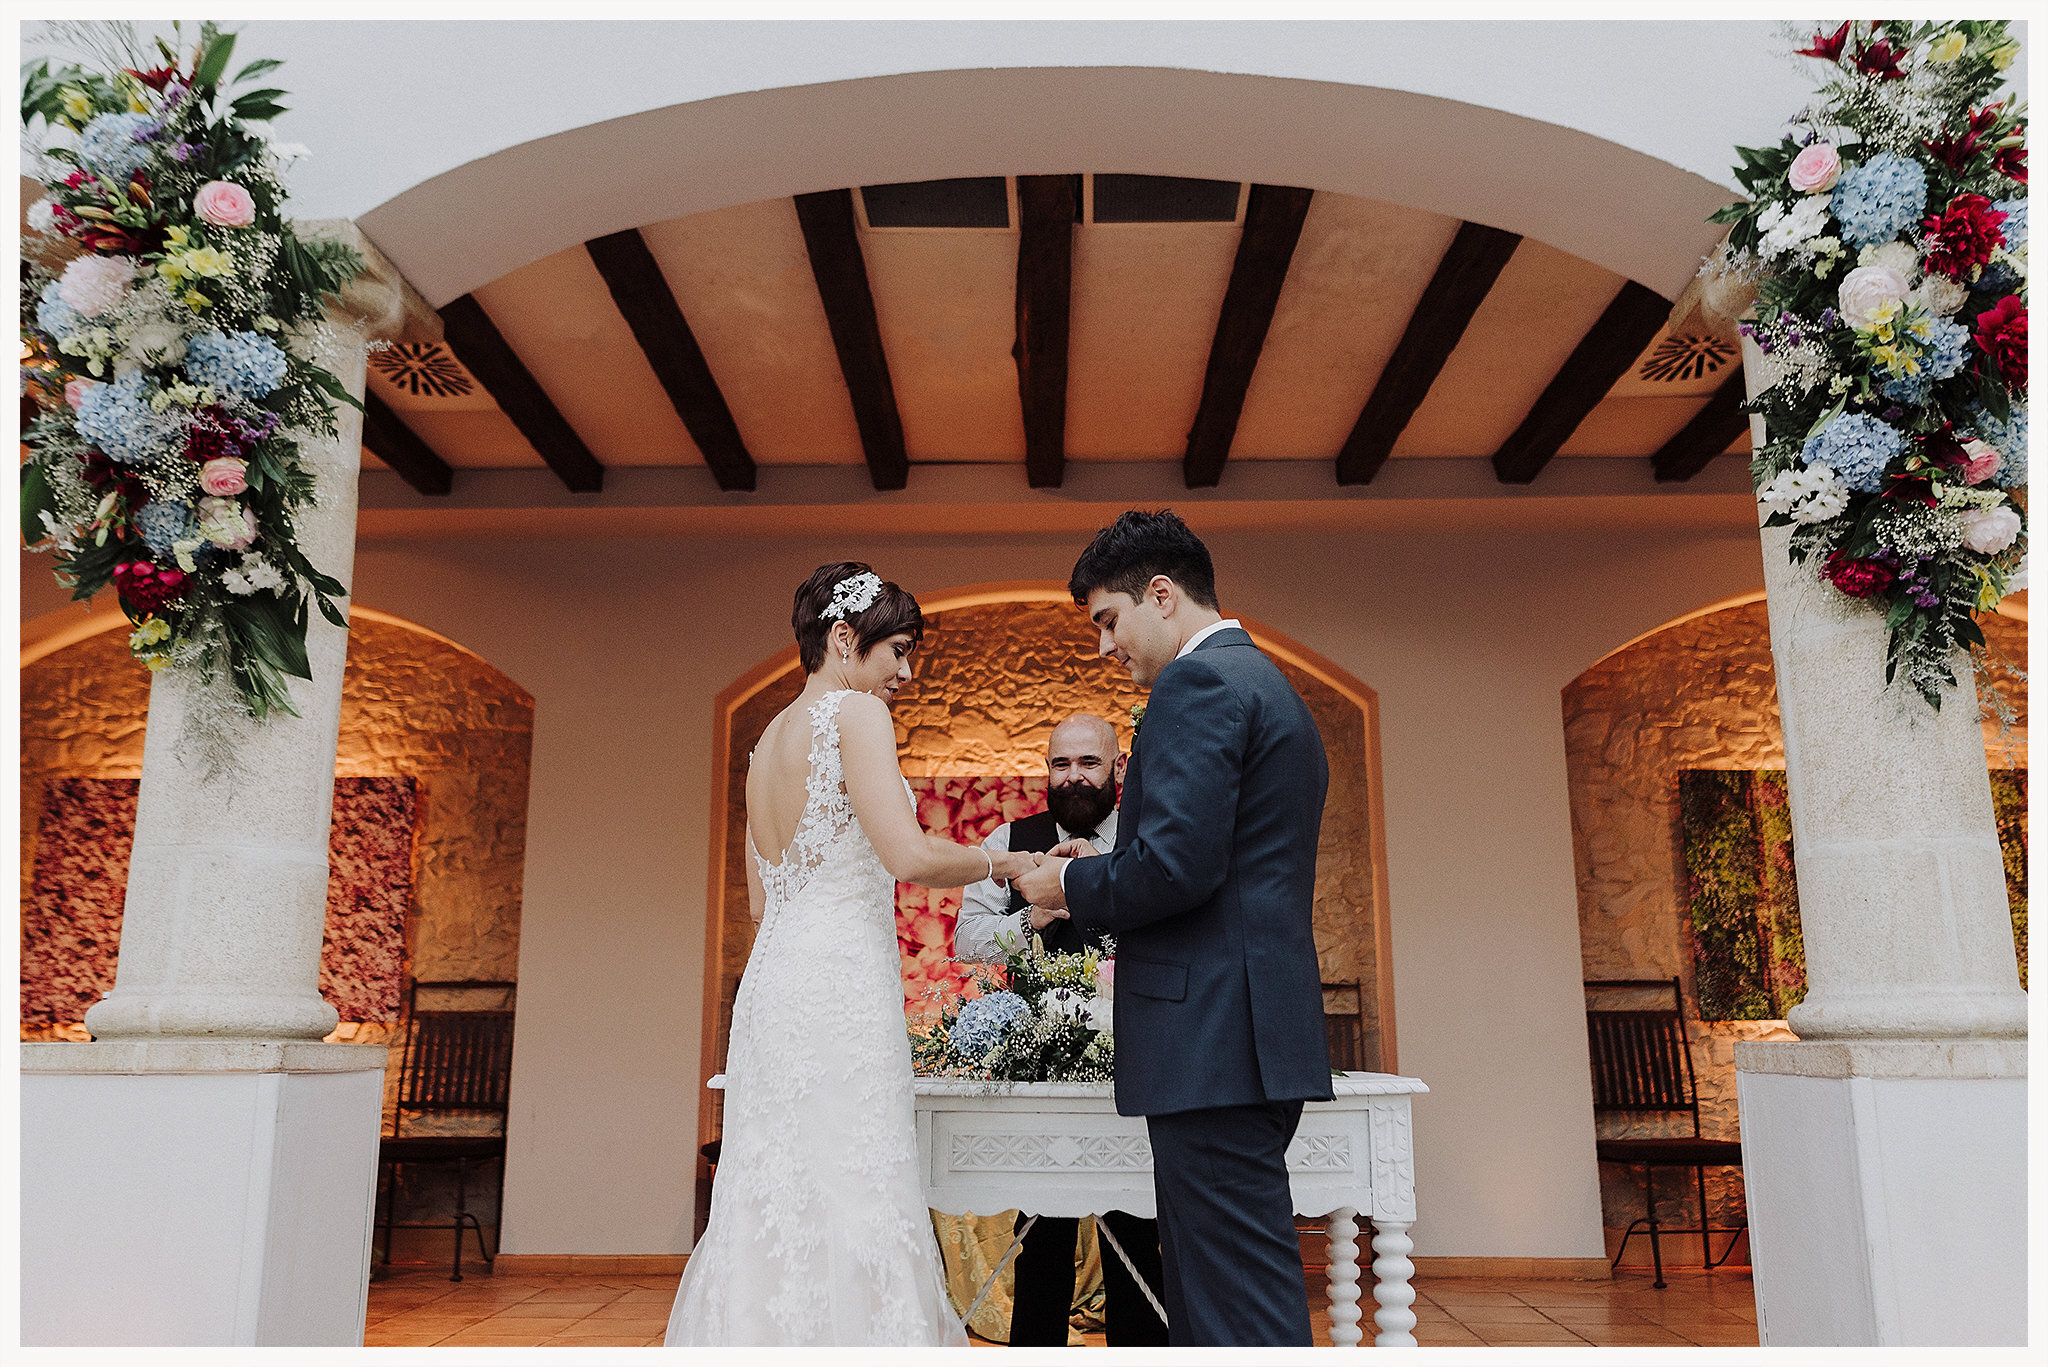 dreamsaanddreamers.com-nunta-33.jpg